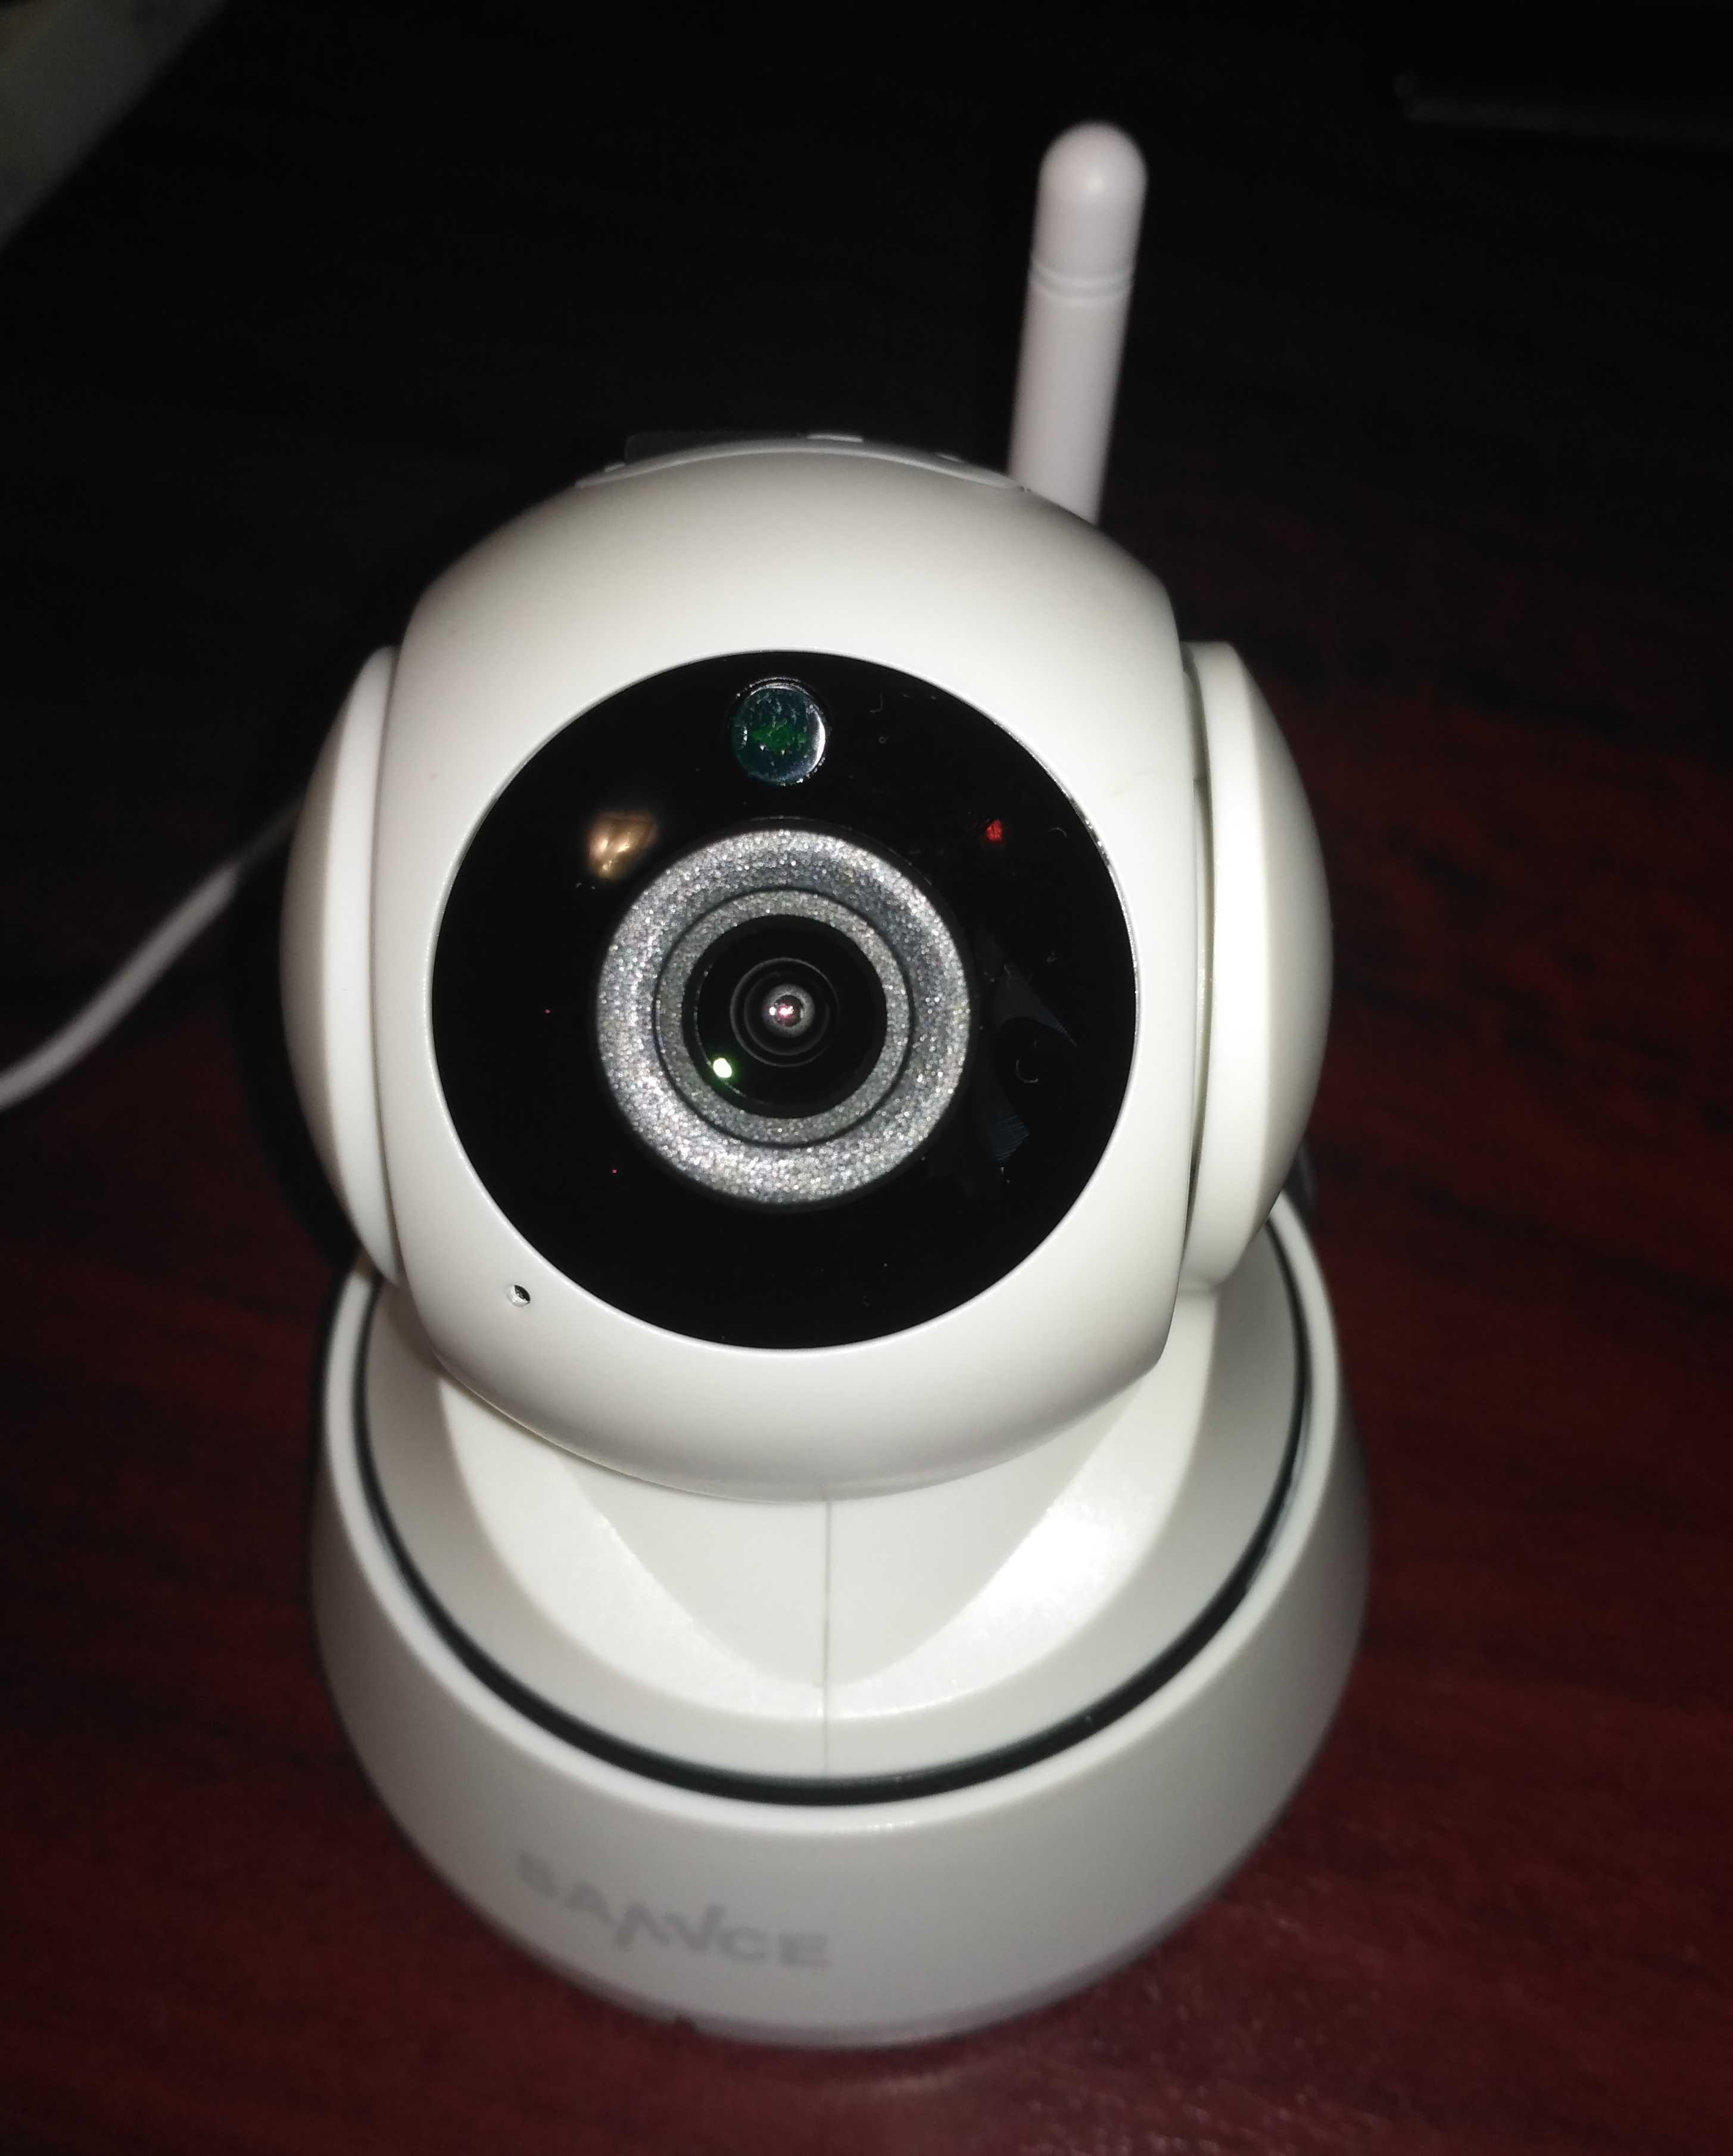 SANNCE 2K Home Security IP Camera Wi Fi Wireless Mini Network Camera Surveillance Wifi 3MP Night Vision CCTV Camera Baby Monitor night vision cctv camera security ipsurveillance wifi - AliExpress